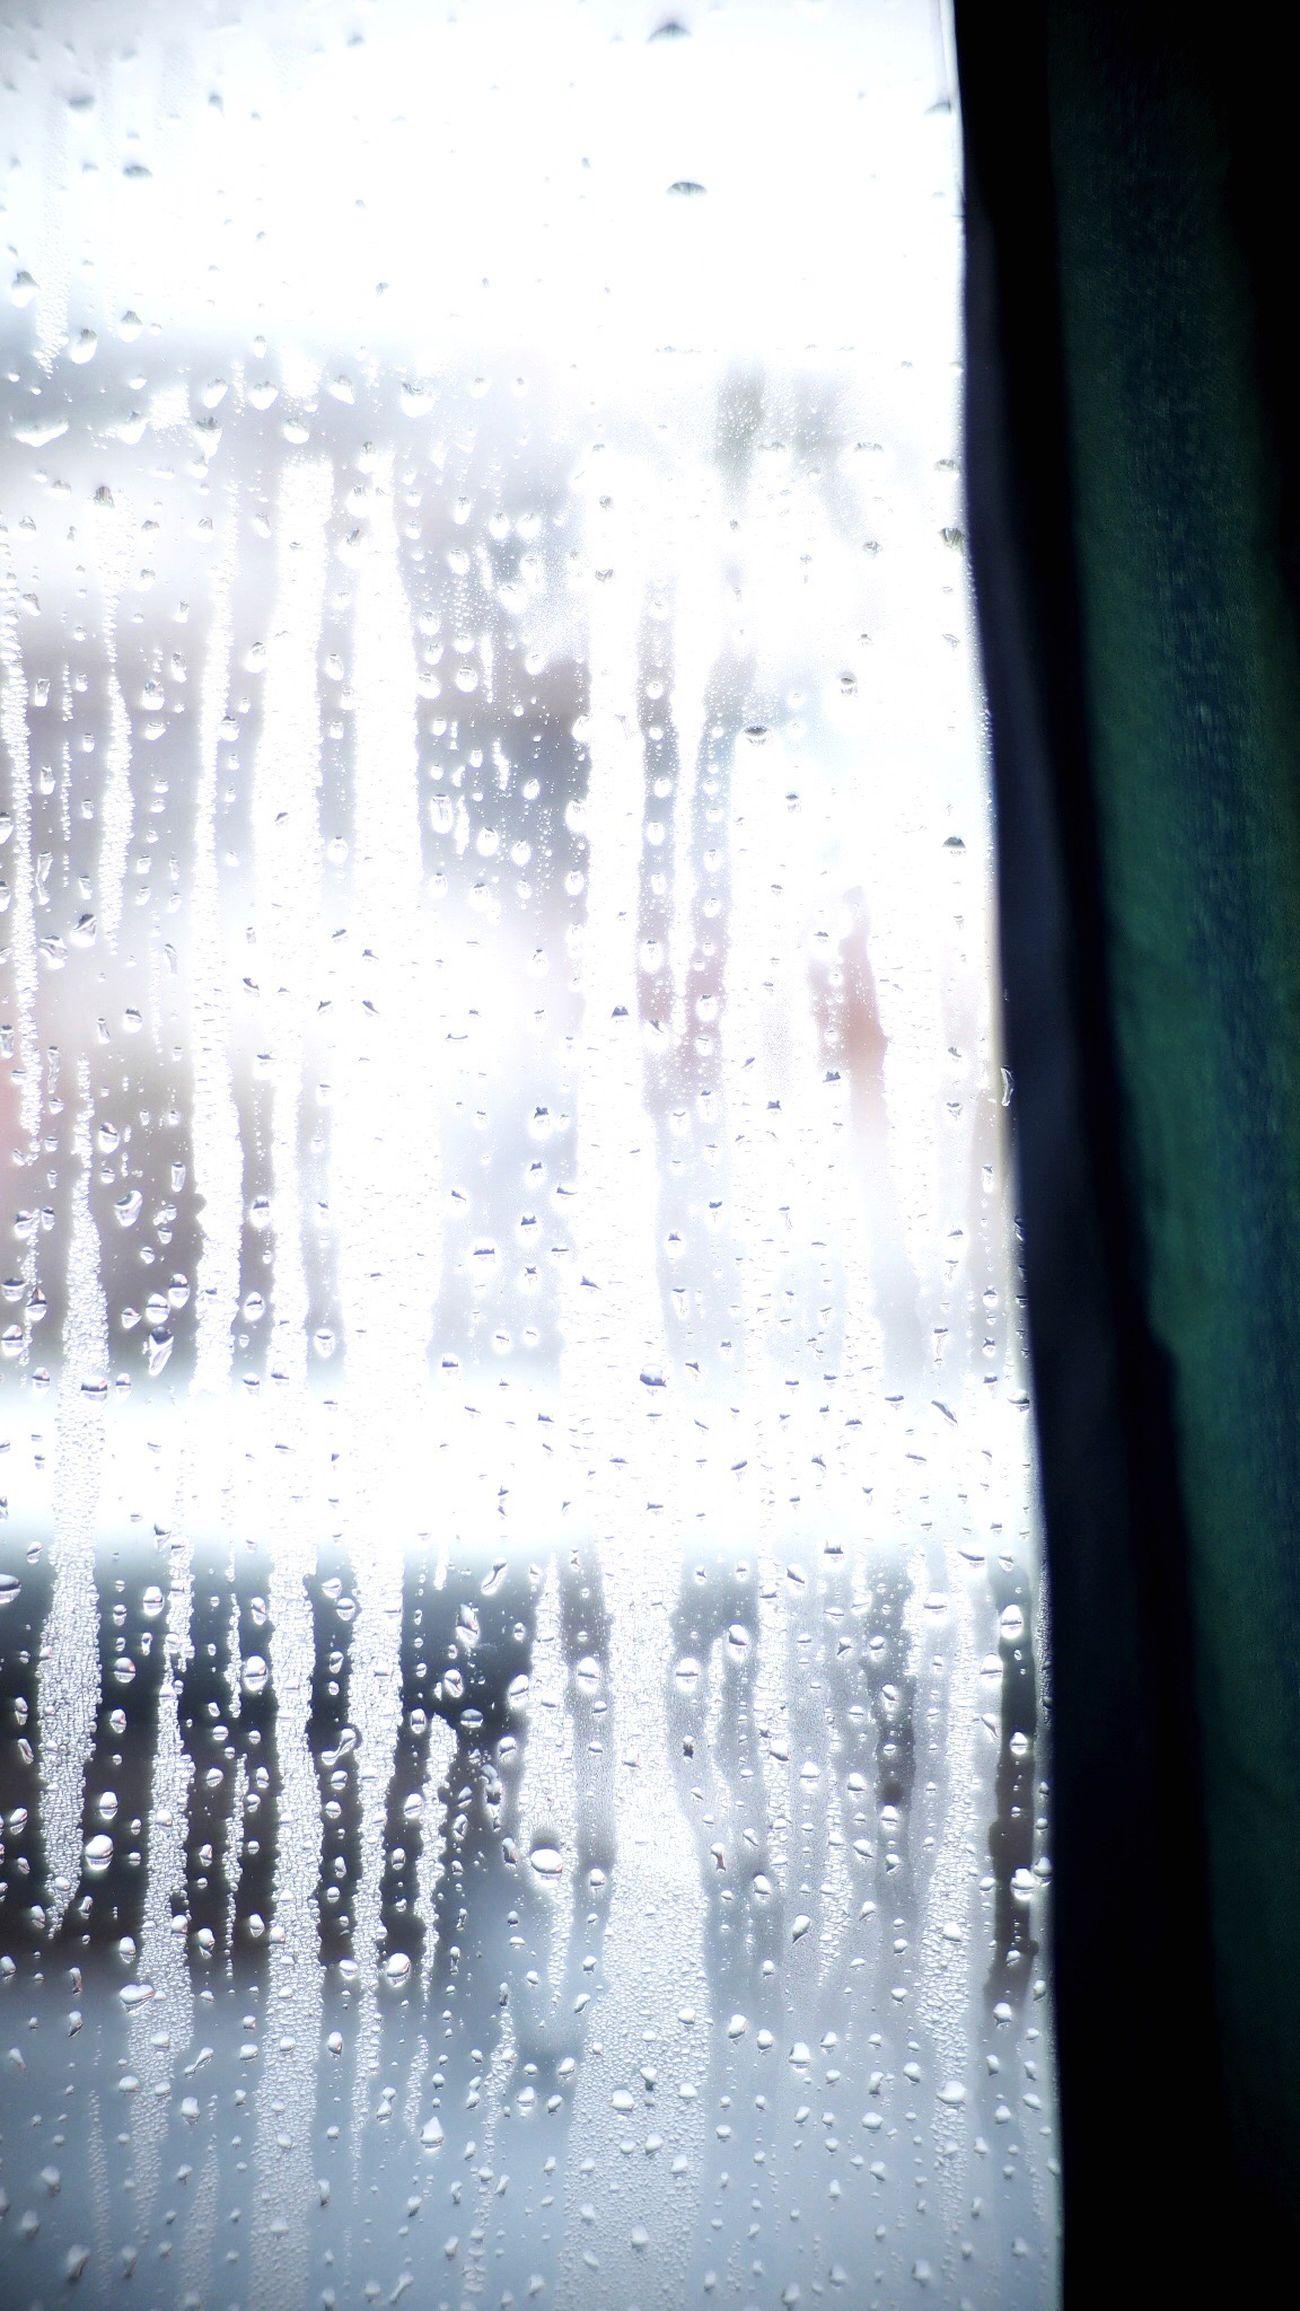 Jan 30,2016 Sat Dew Condensation Window Rainy Days